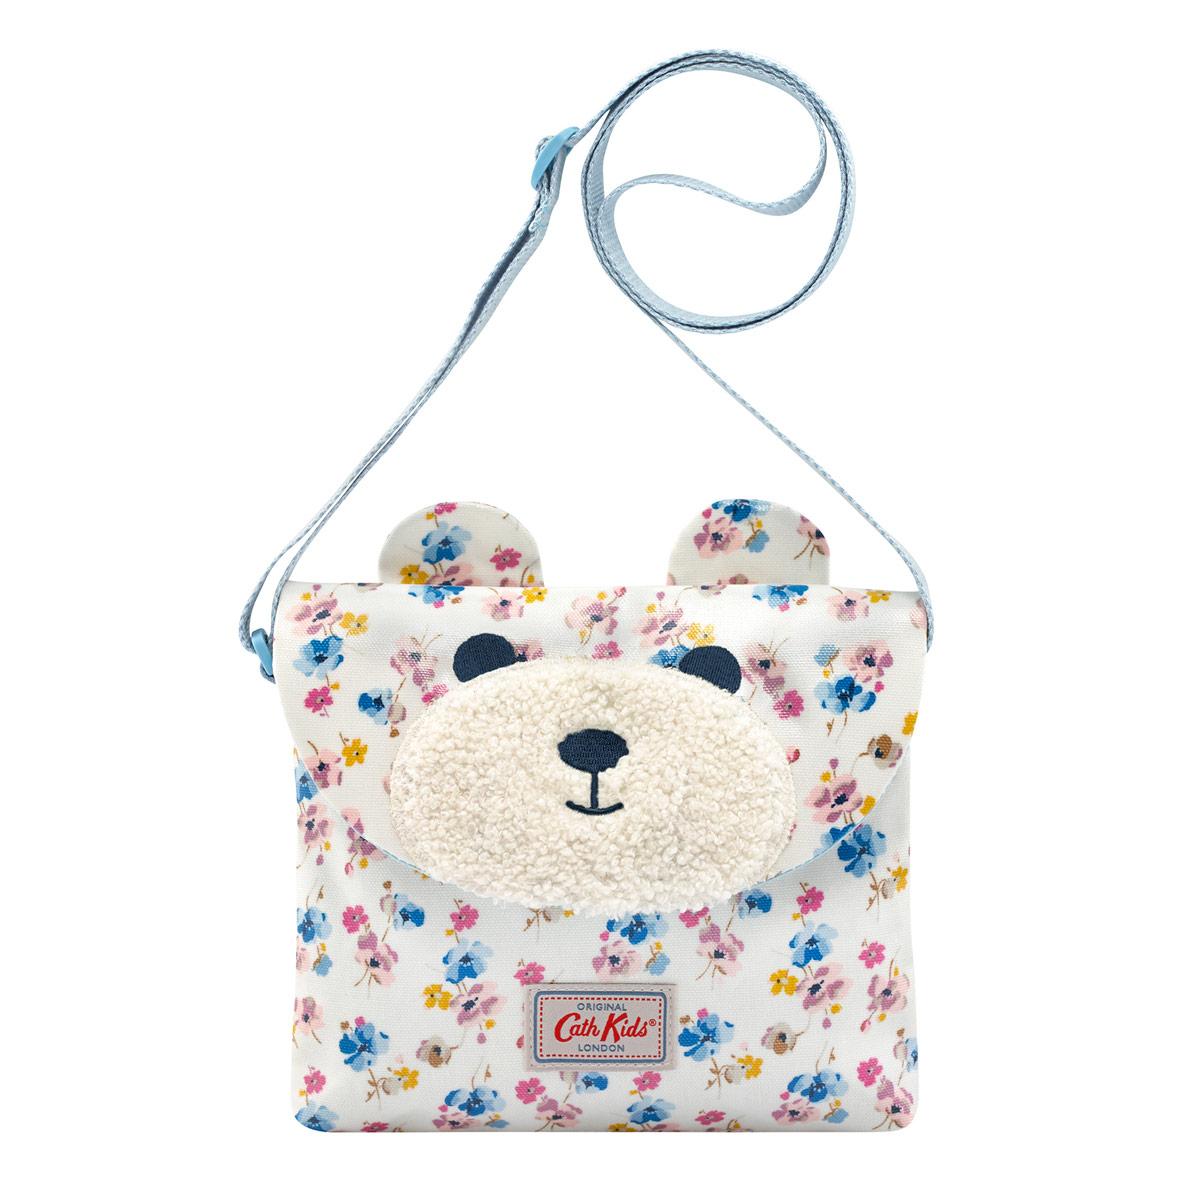 Cath Kidston girls' bear handbag £8.10 with code - Free c&c